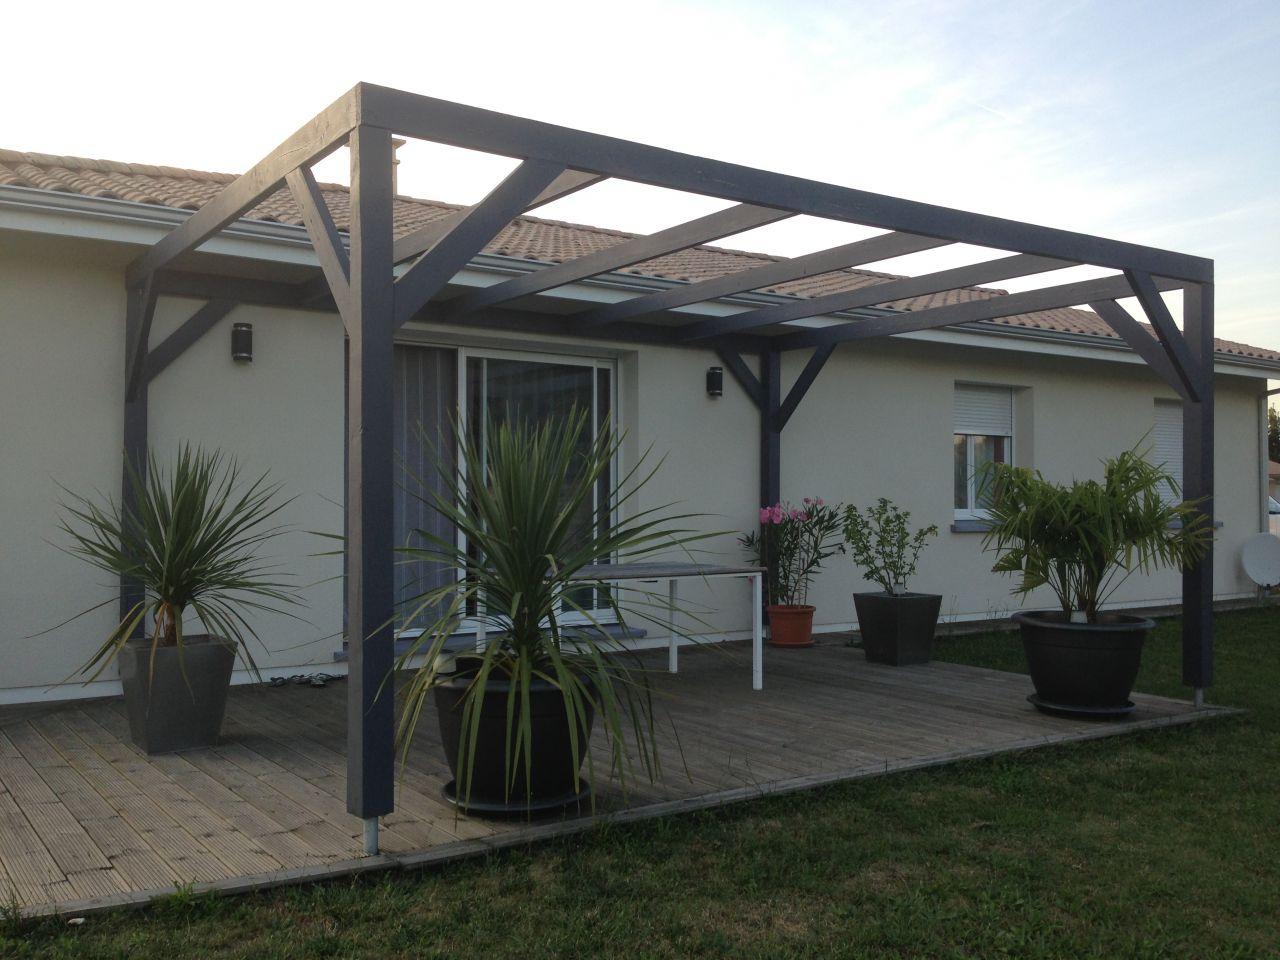 Pergola - Gironde (33) - aout 2013